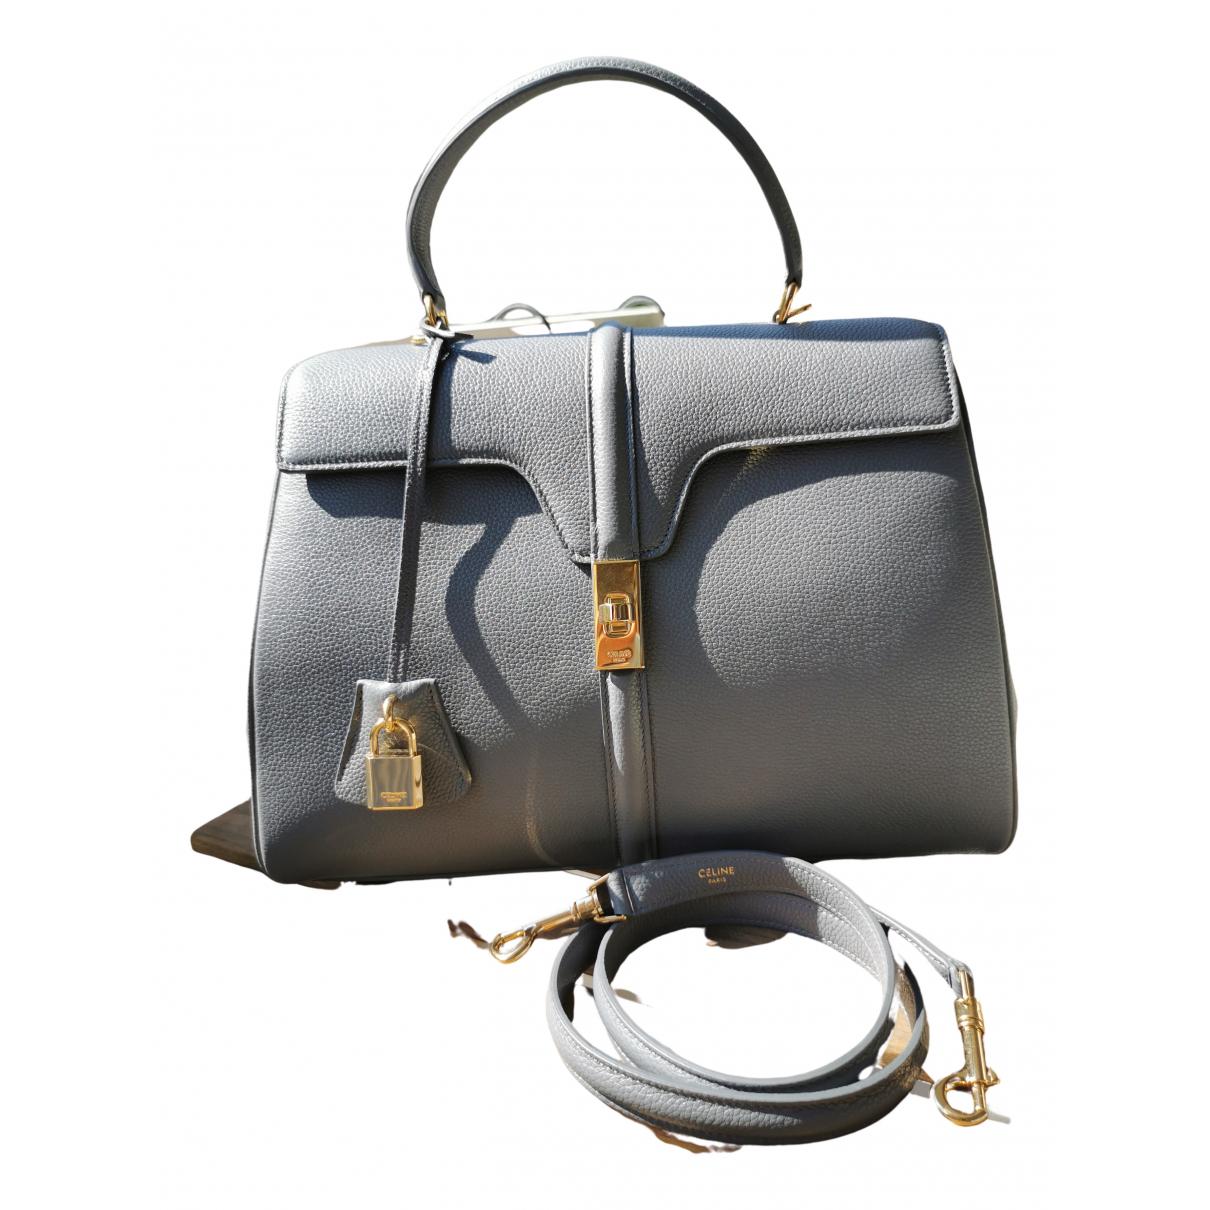 Celine Sac 16 Grey Fur handbag for Women \N